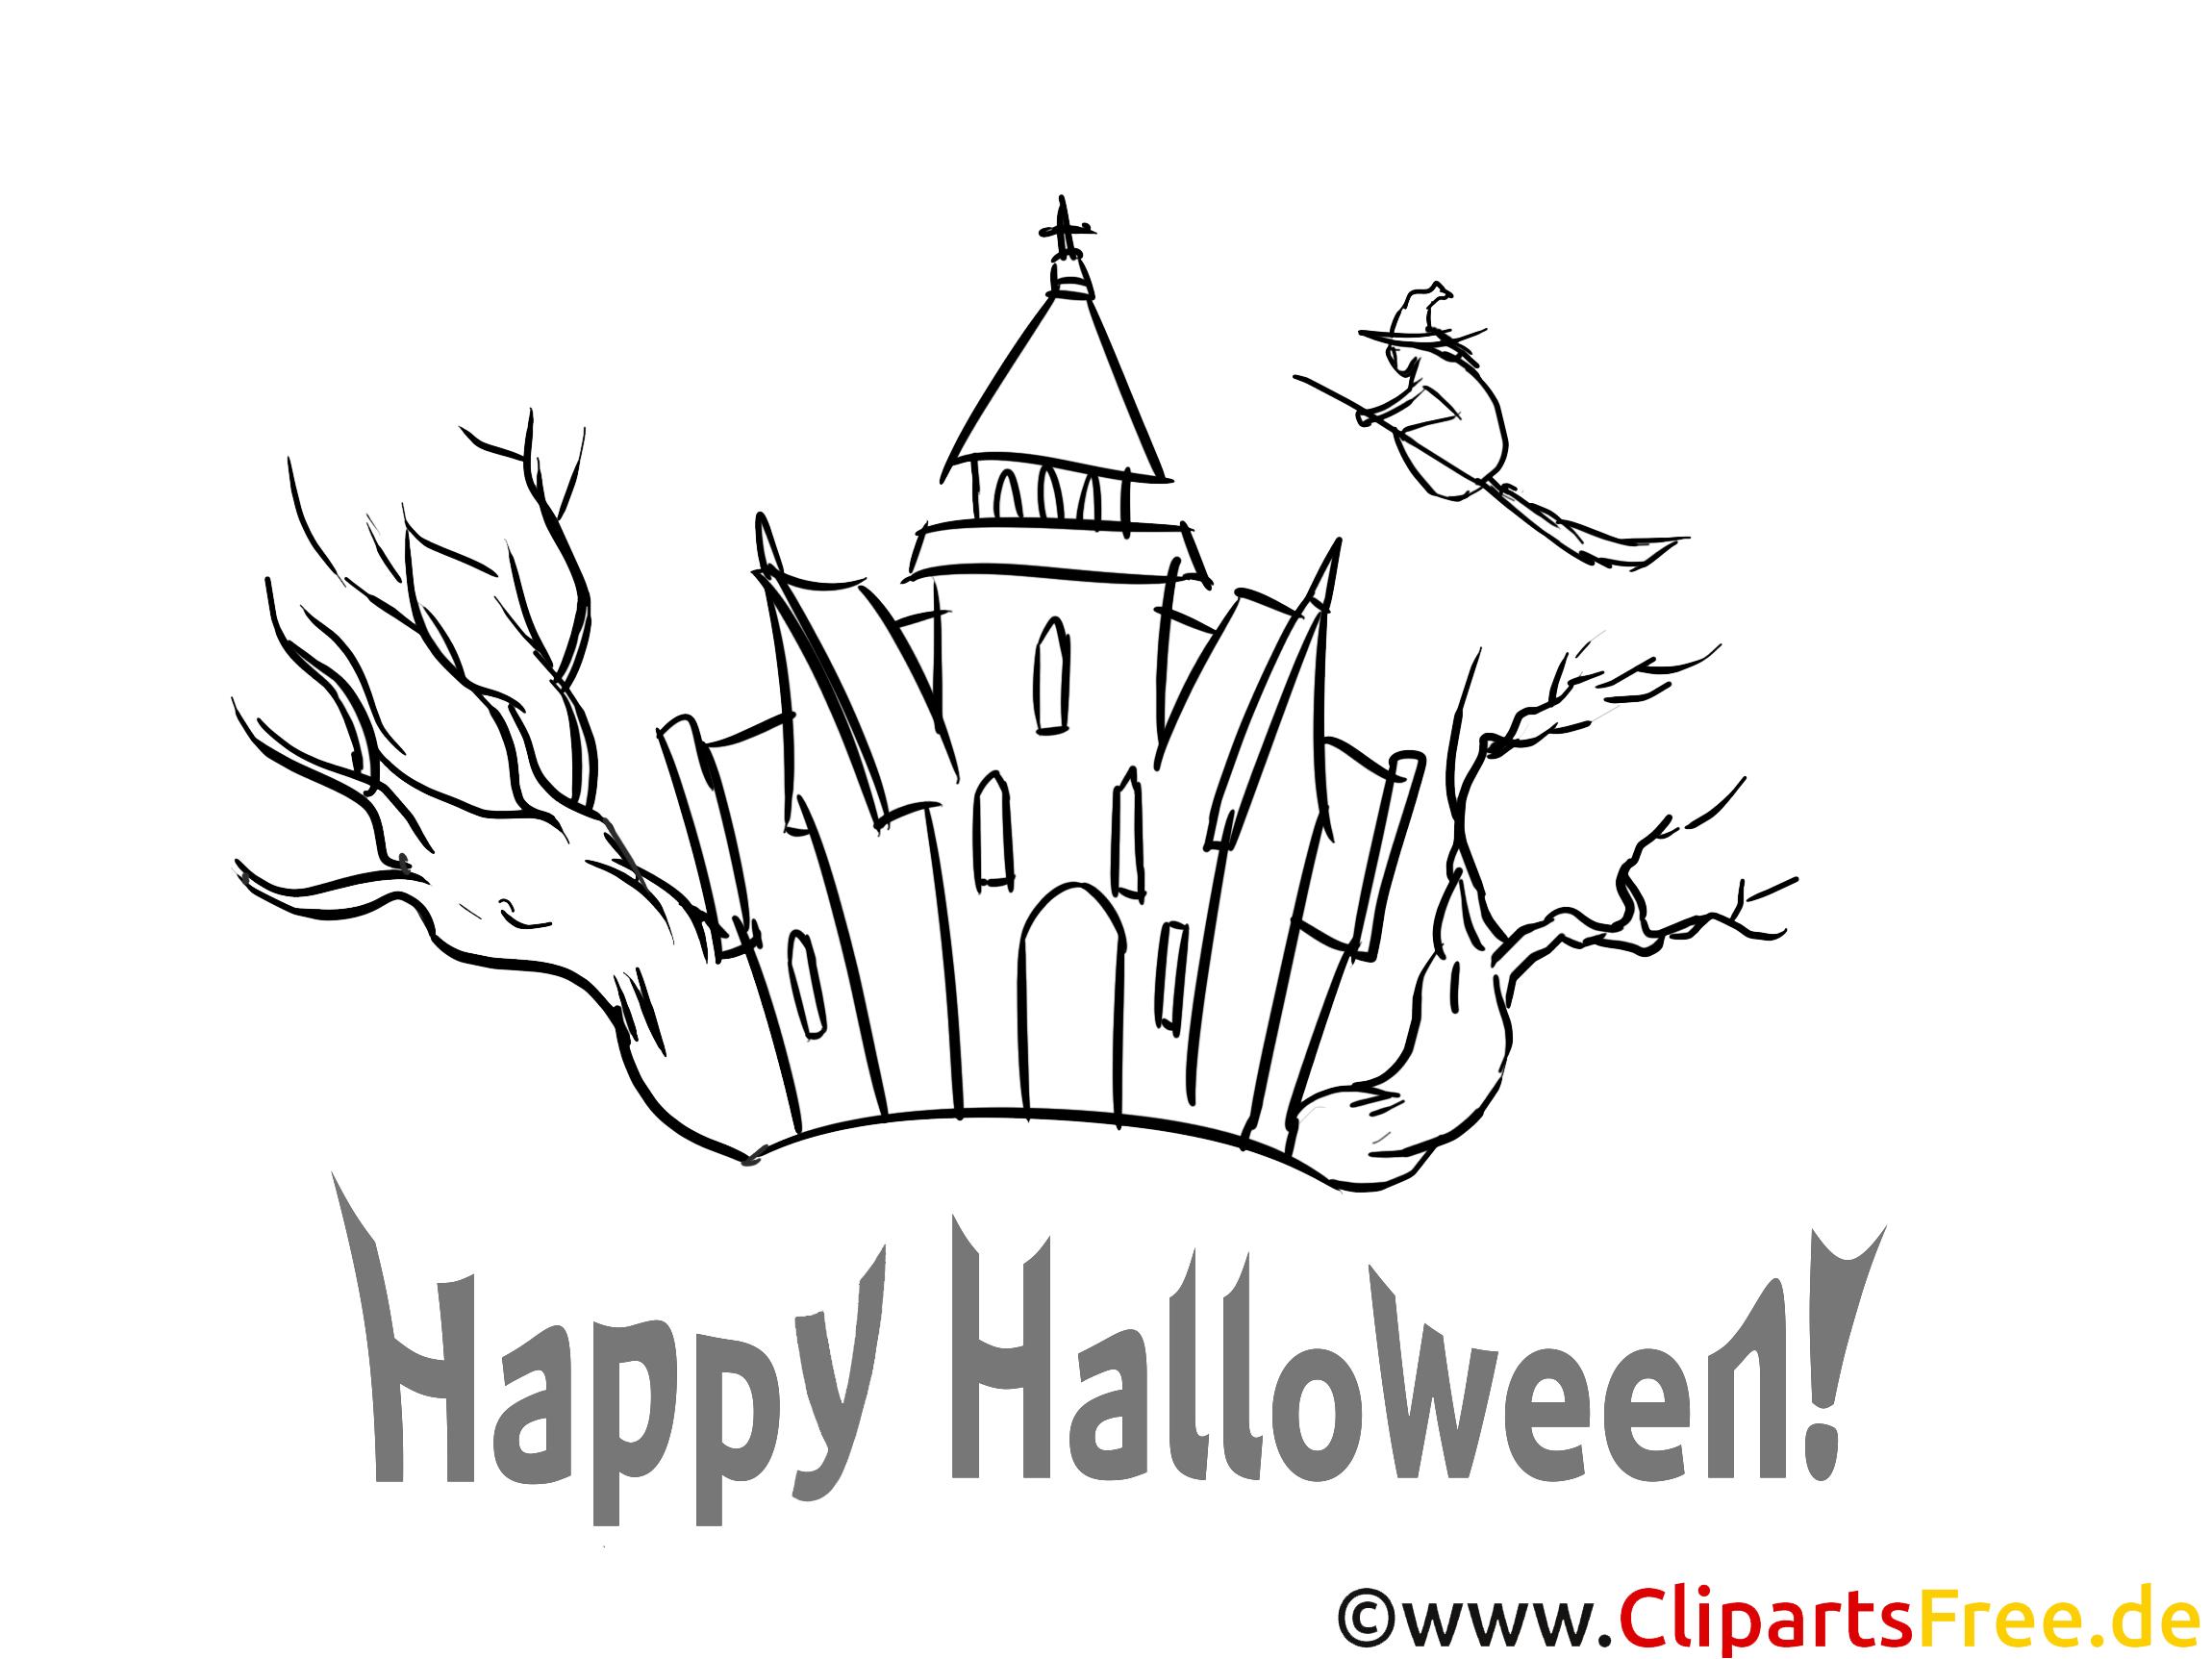 Ausmalbild Halloween mit Burg